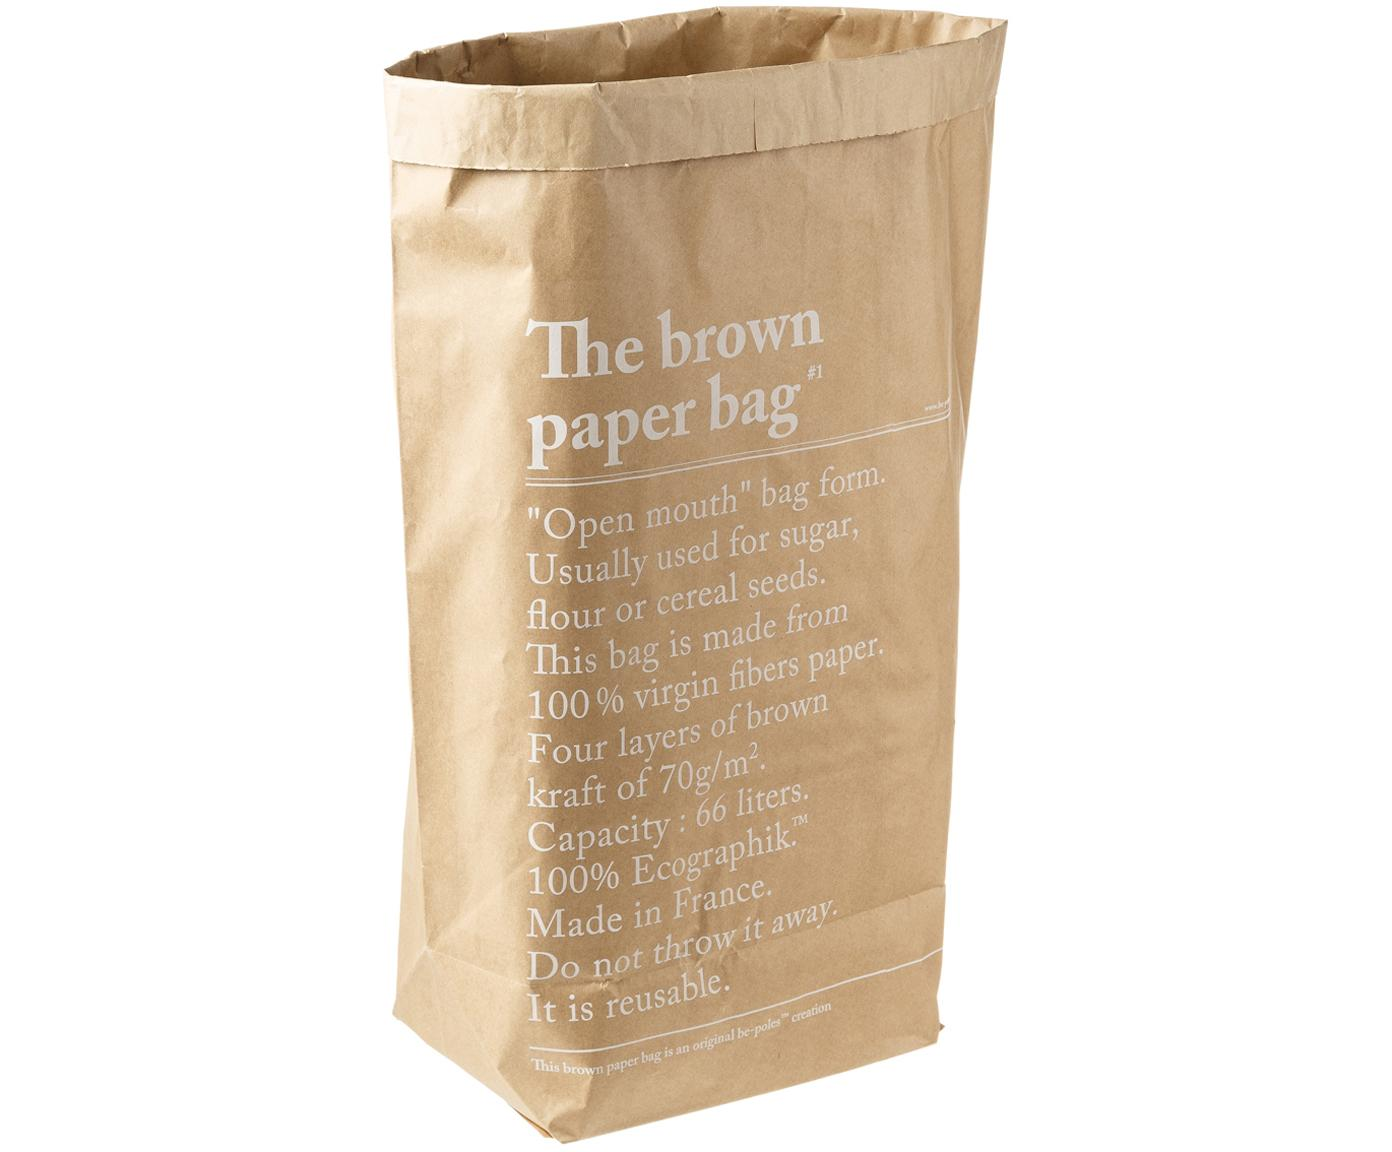 Aufbewahrungstüten Le sac en kraft brun, 2 Stück, Frischfaserpapier, Braun, 50 x 69 cm